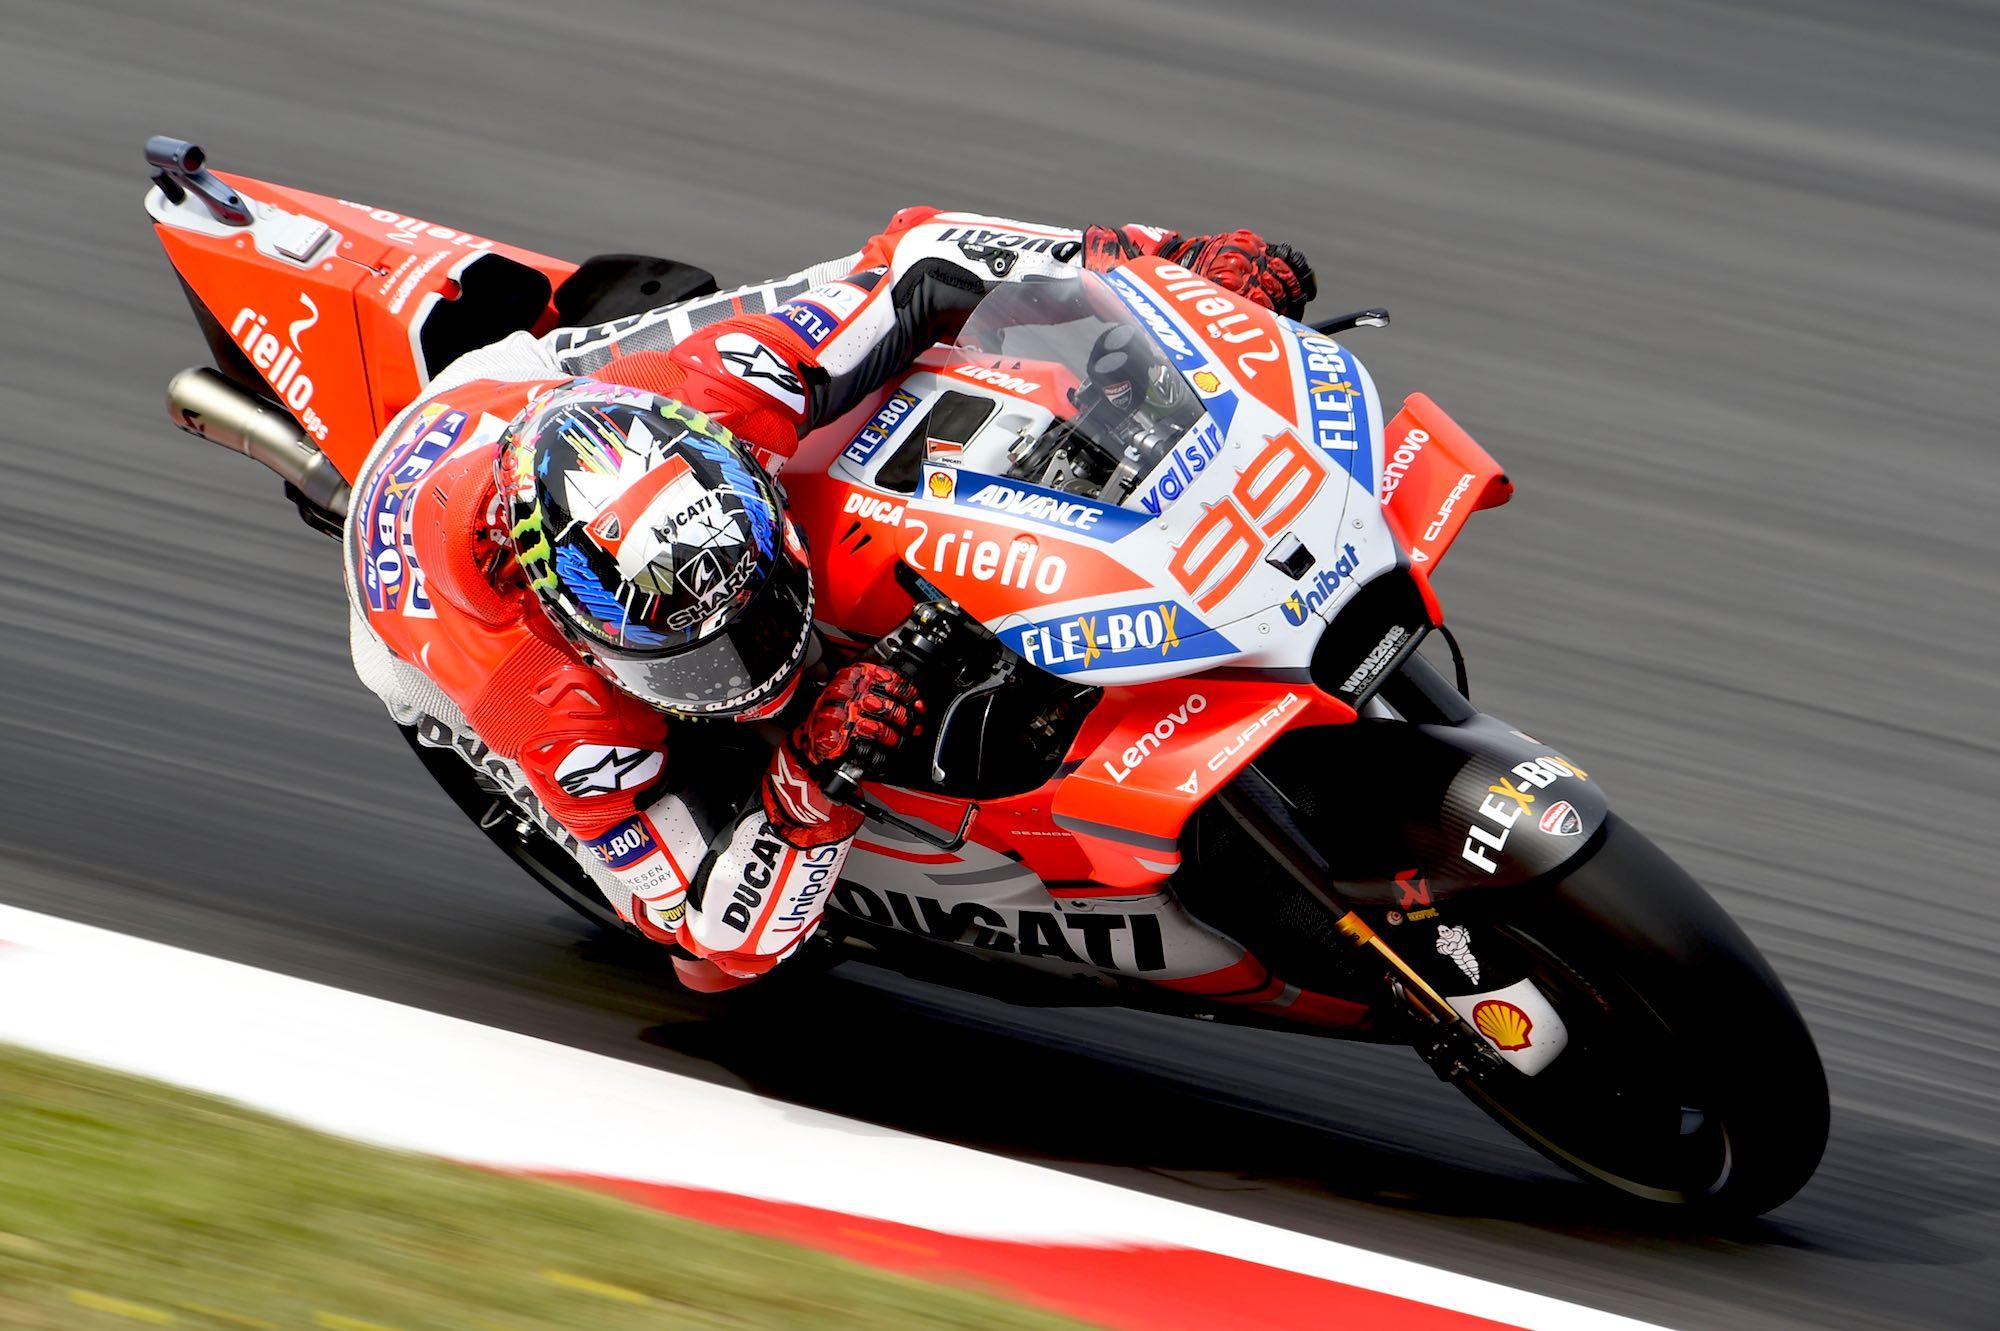 Jorge Lorenzo se aferra al martillo y suma su segunda victoria con Ducati